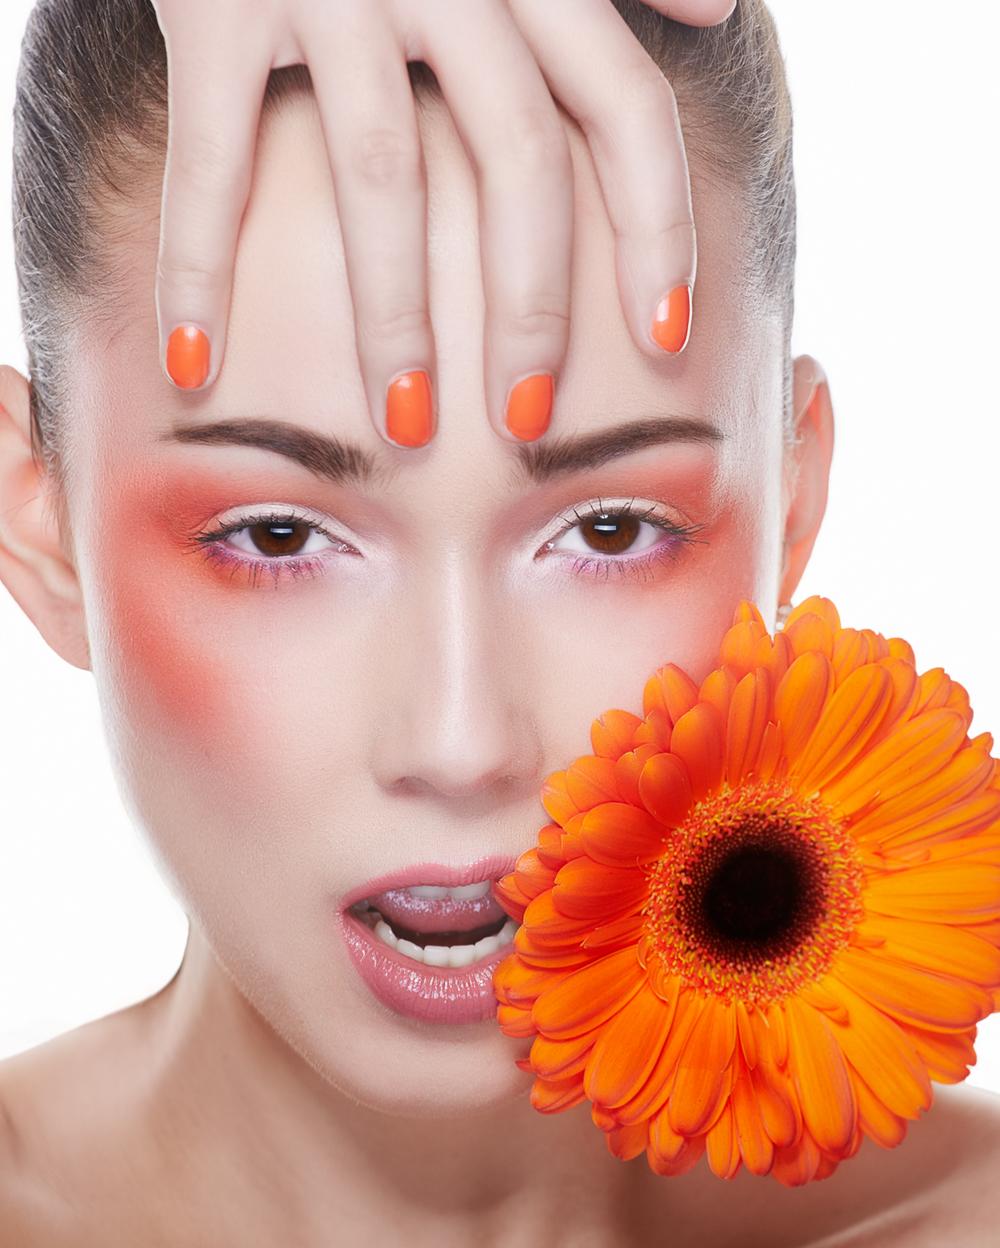 K14_9967-312-Kamal Mostofi-ZyZi Makeup-FlowerBeauty.jpg